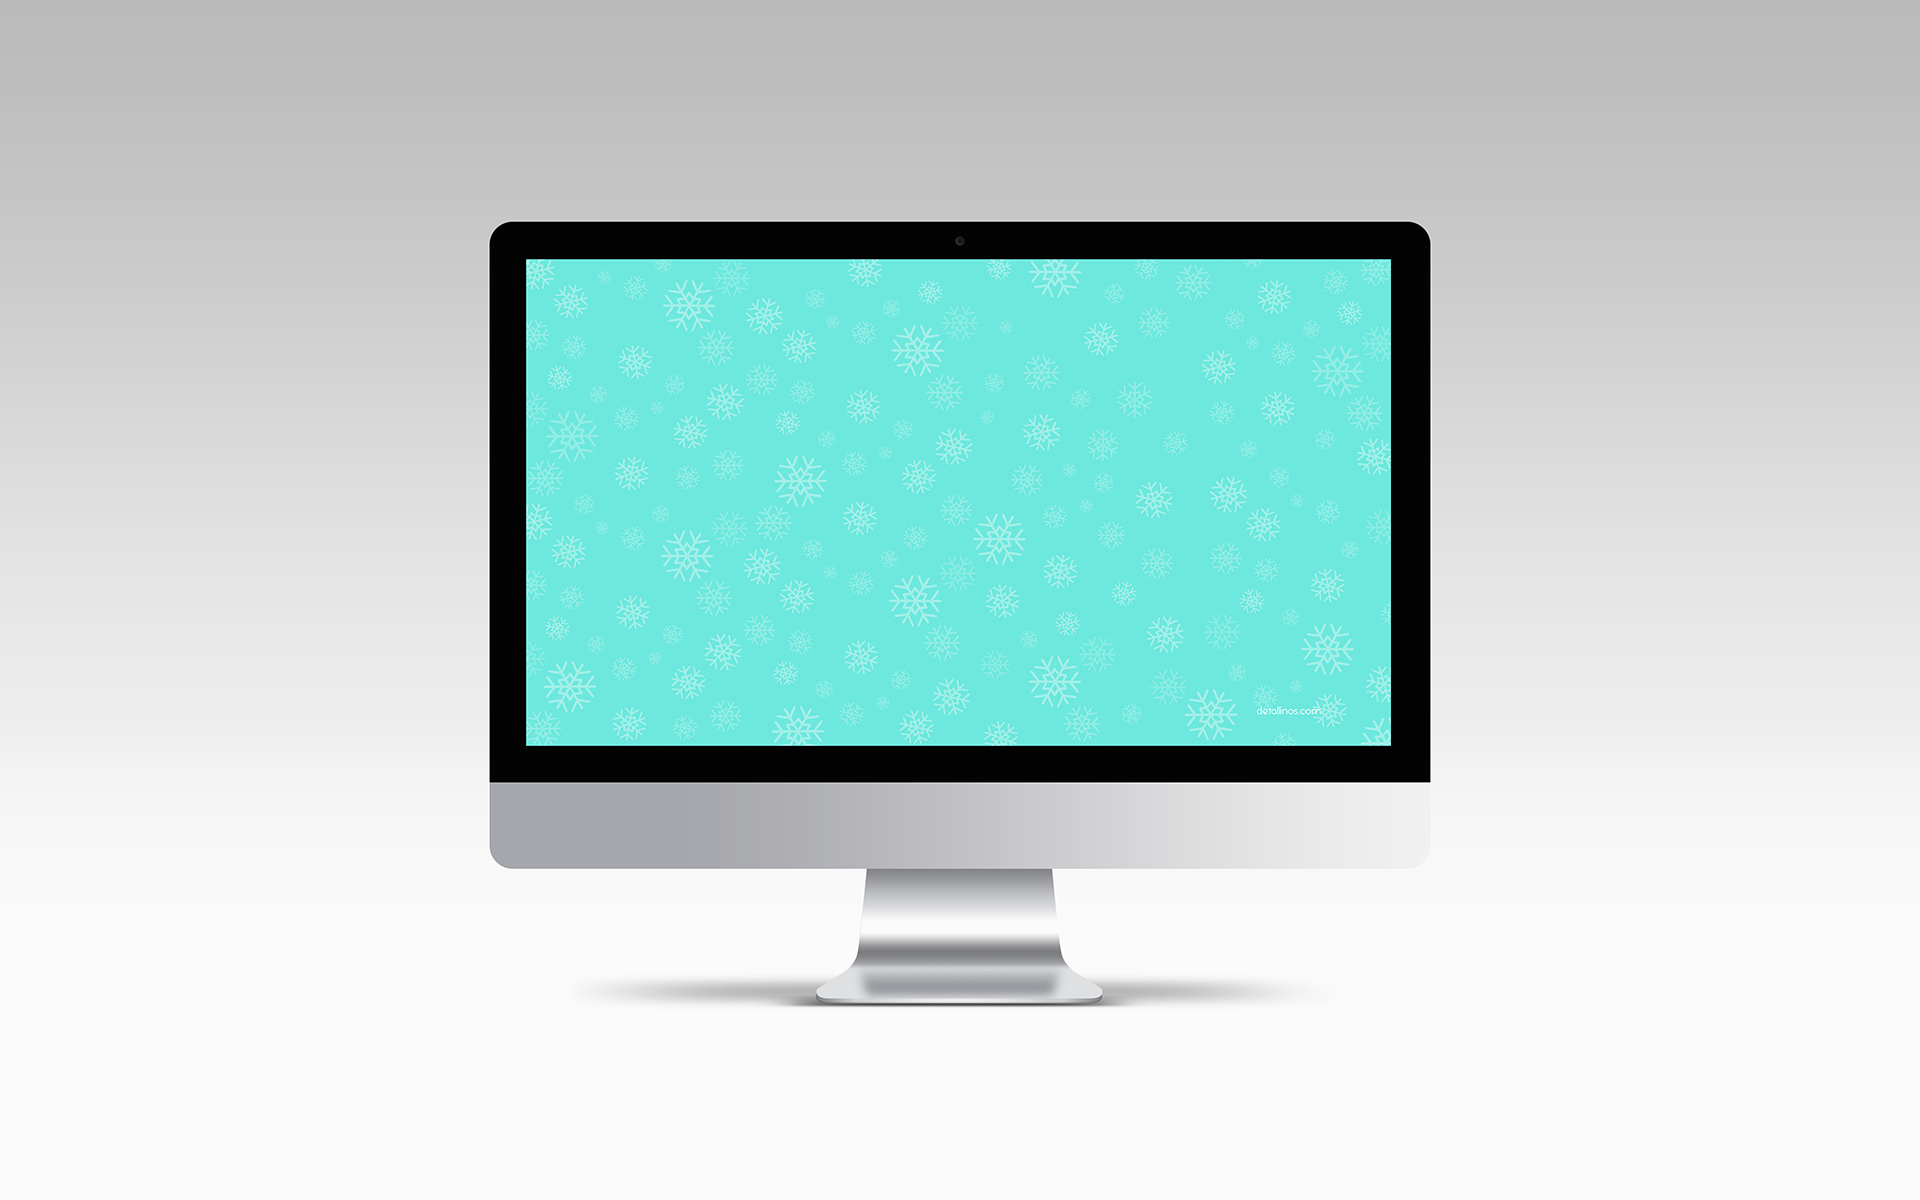 Invernal, iMac